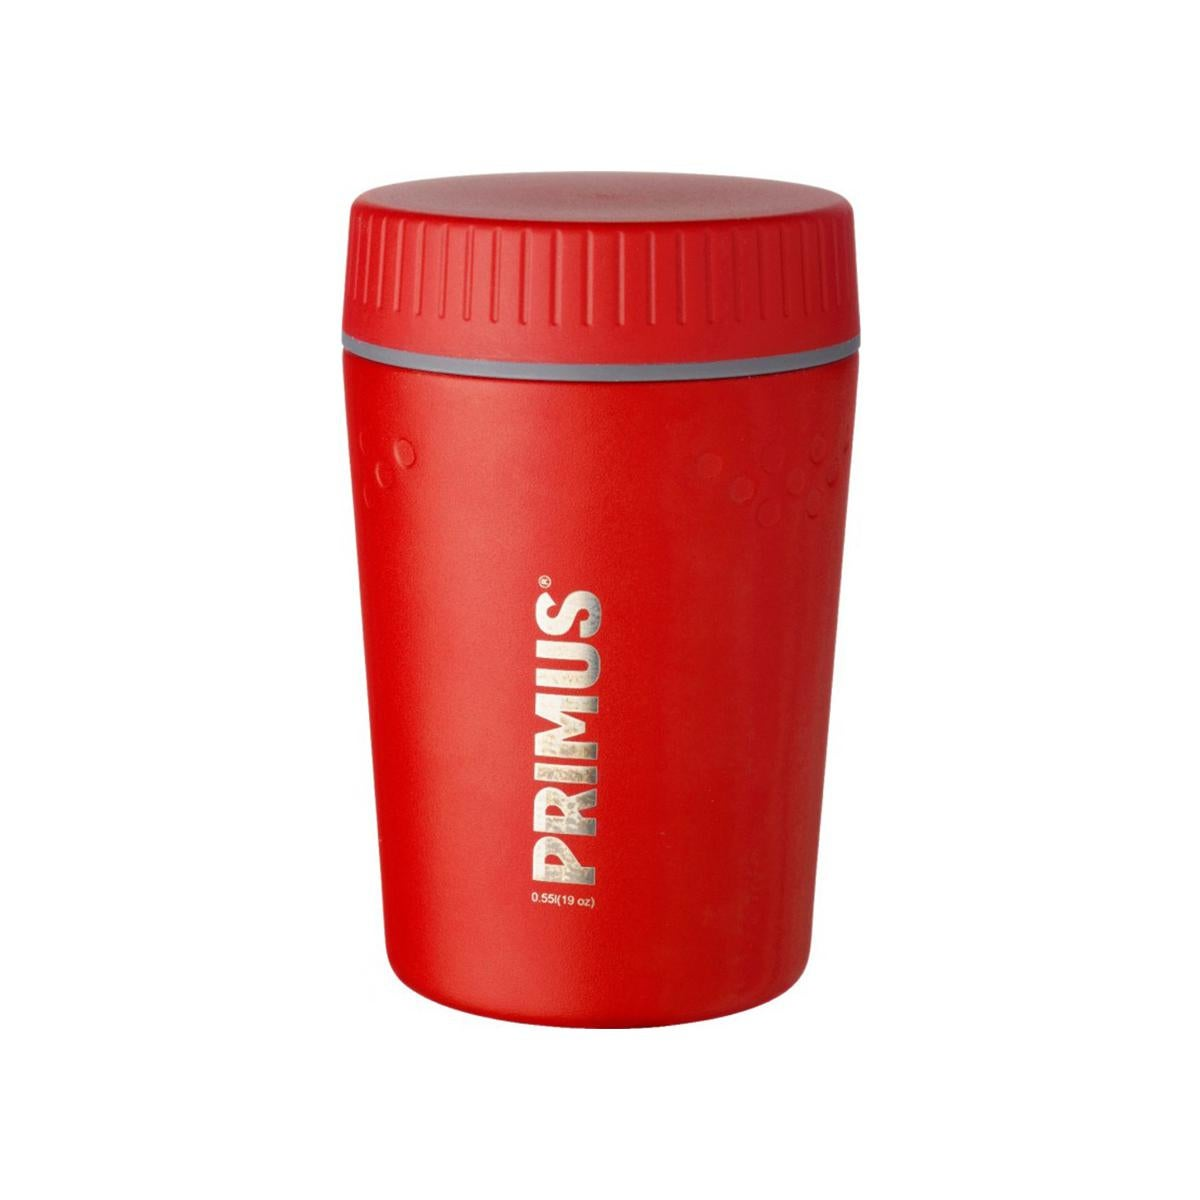 Primus Trailbreak Lunch Jug 550 ml-Red